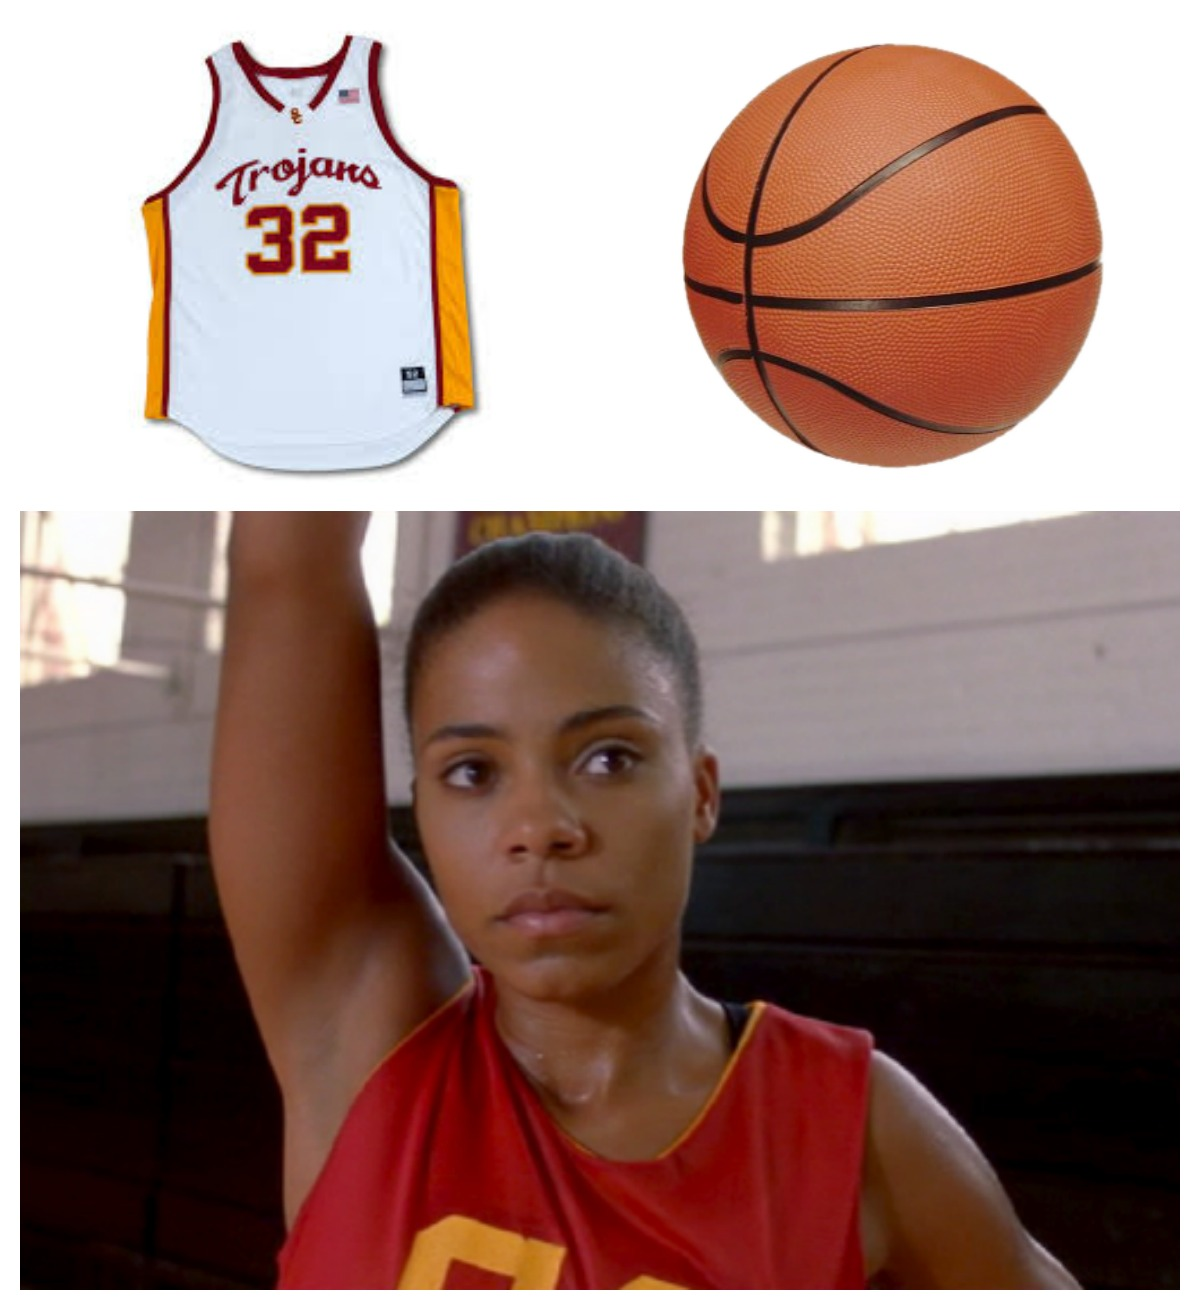 monica-basketball-costume